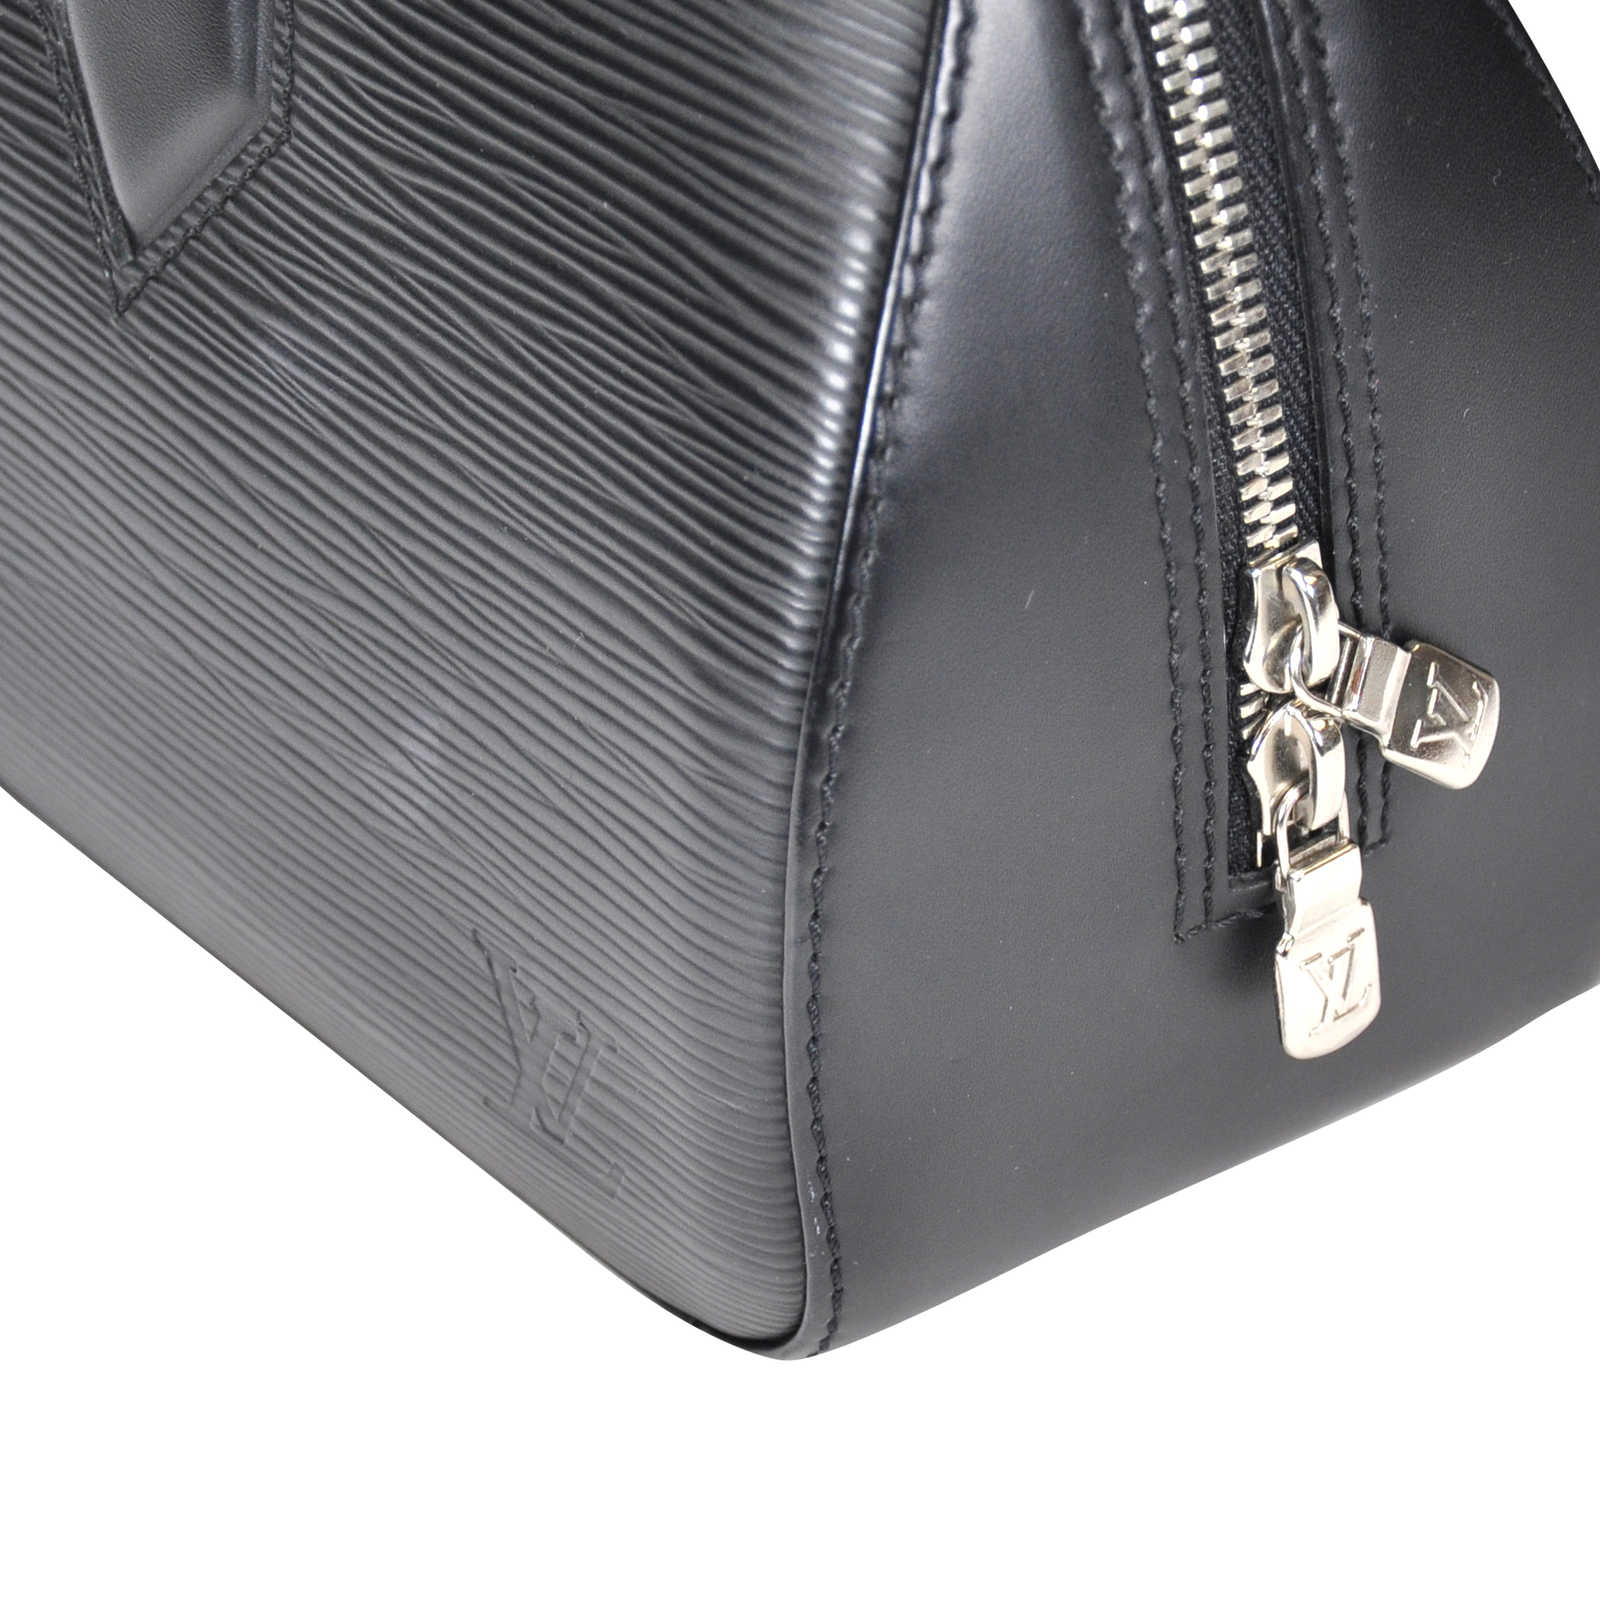 bfcf6f1dfe69 ... Authentic Second Hand Louis Vuitton Jasmin Bag (PSS-094-00007) -  Thumbnail ...